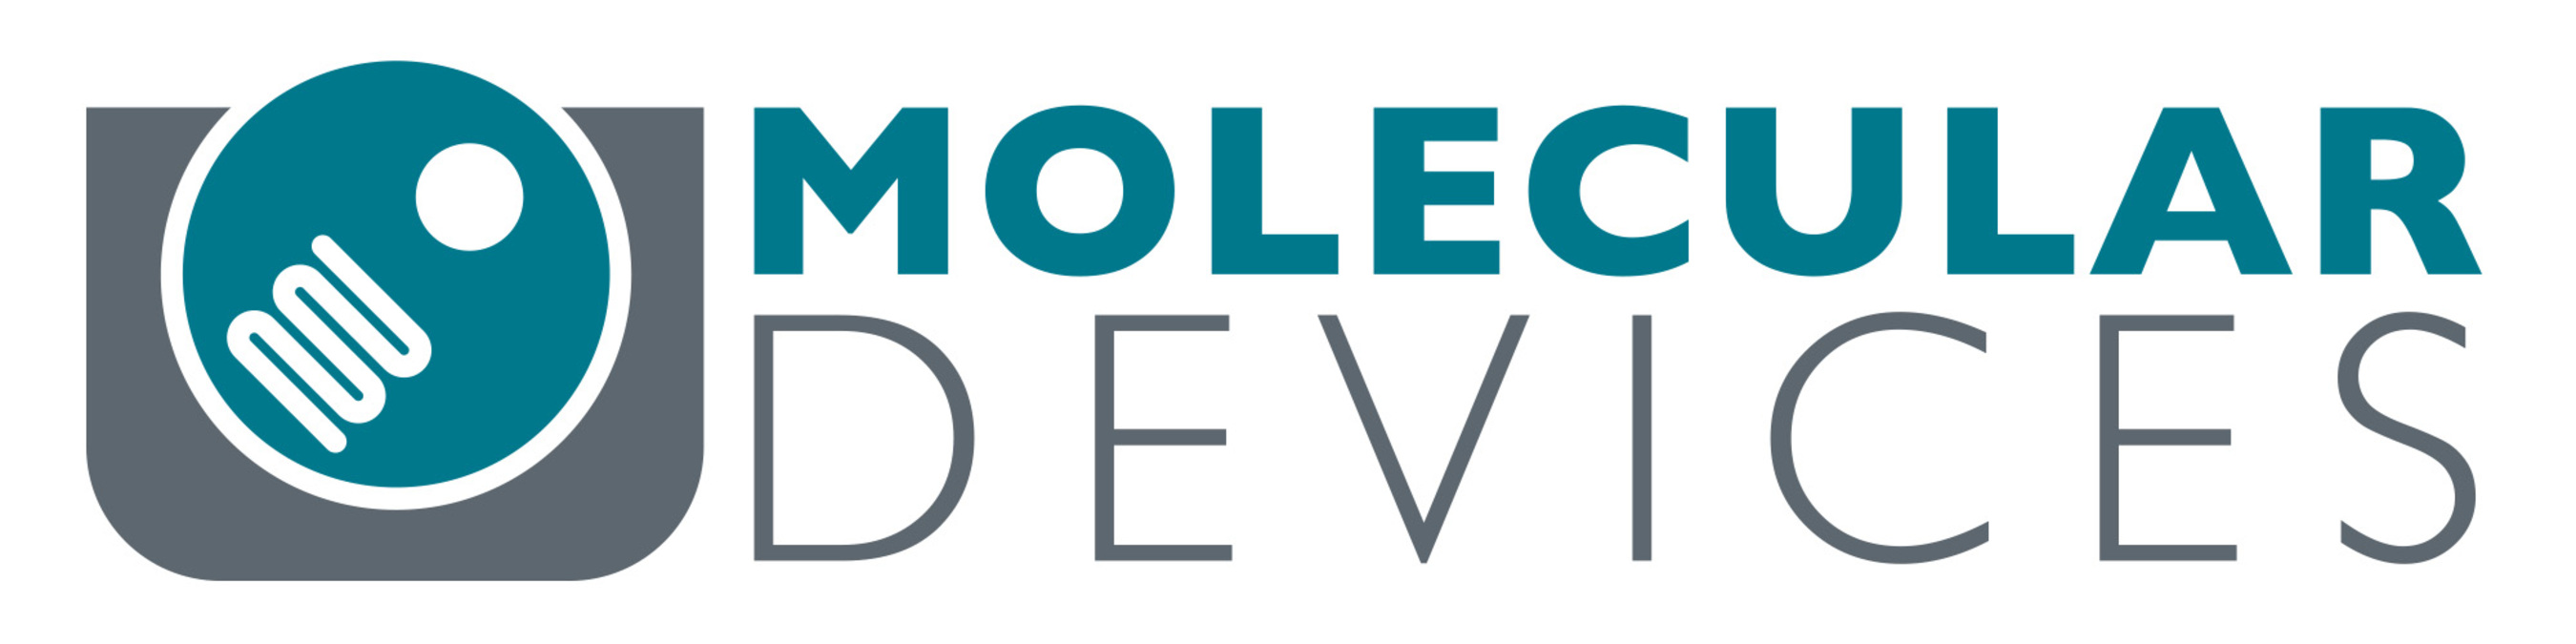 Molecular Devices, Inc. logo. (PRNewsFoto/Molecular Devices, Inc.) (PRNewsFoto/)